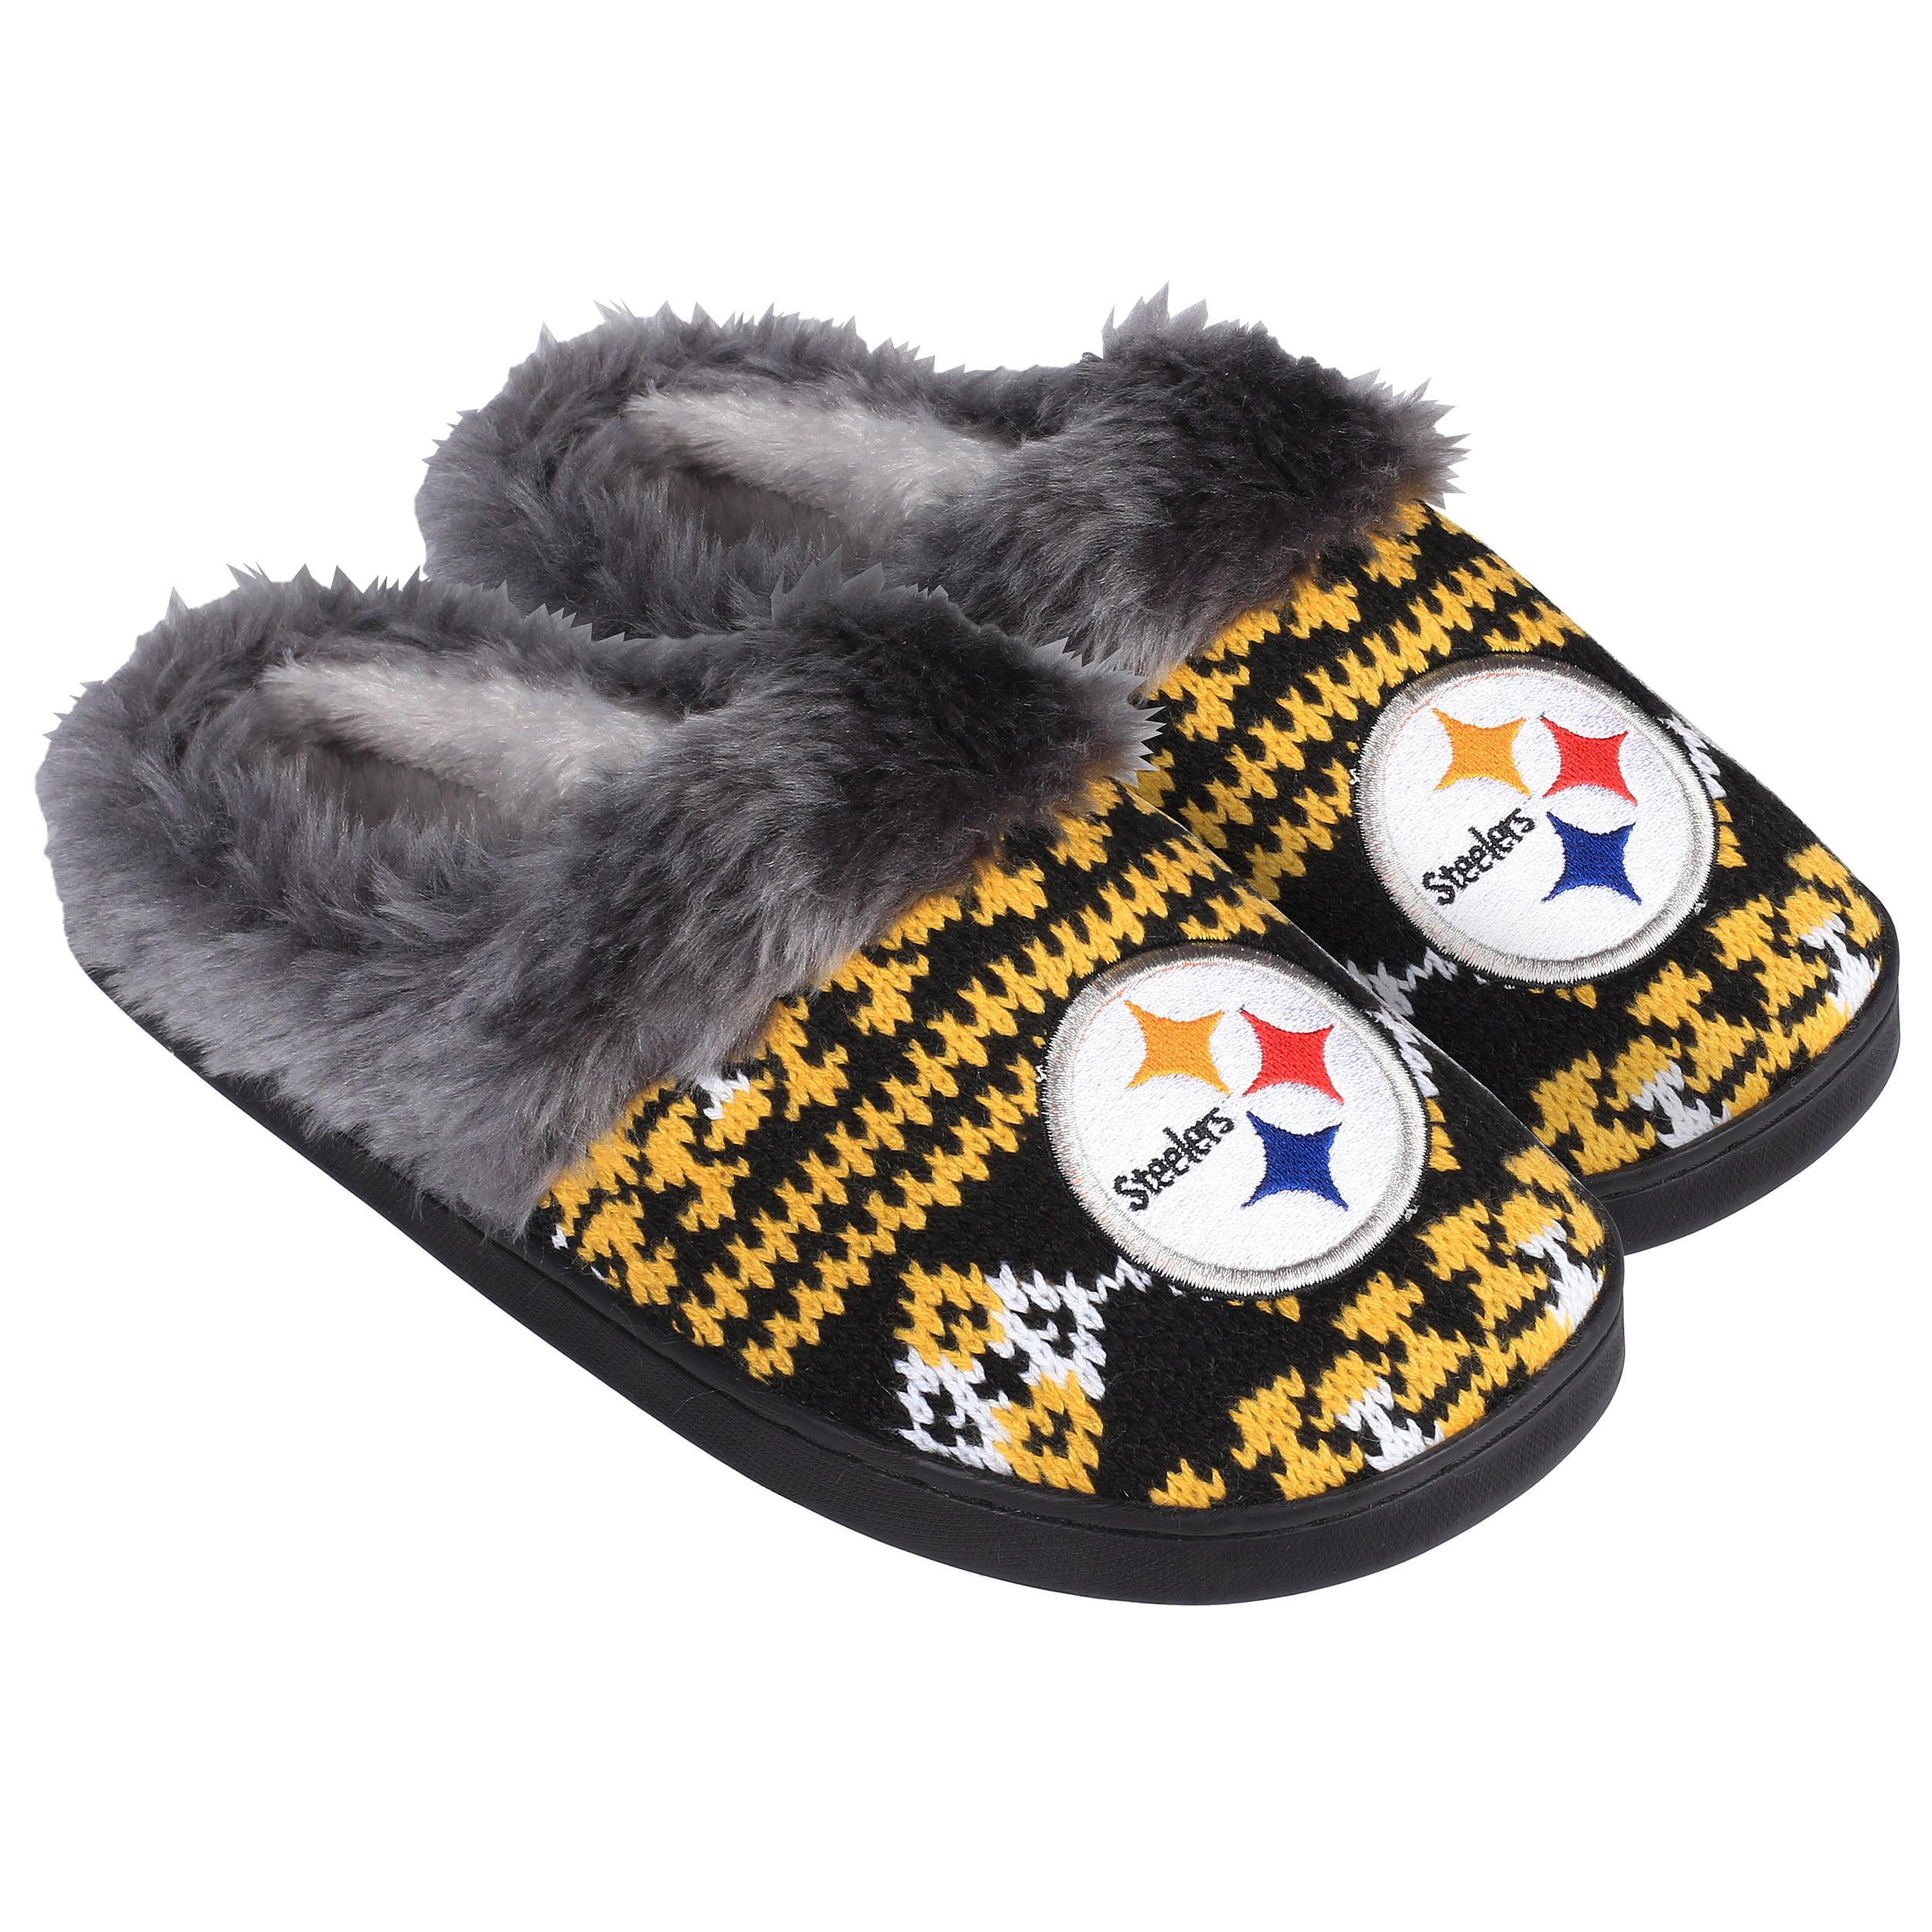 Pittsburgh Steelers Women's Aztec Slide Slipper - 12pc Case